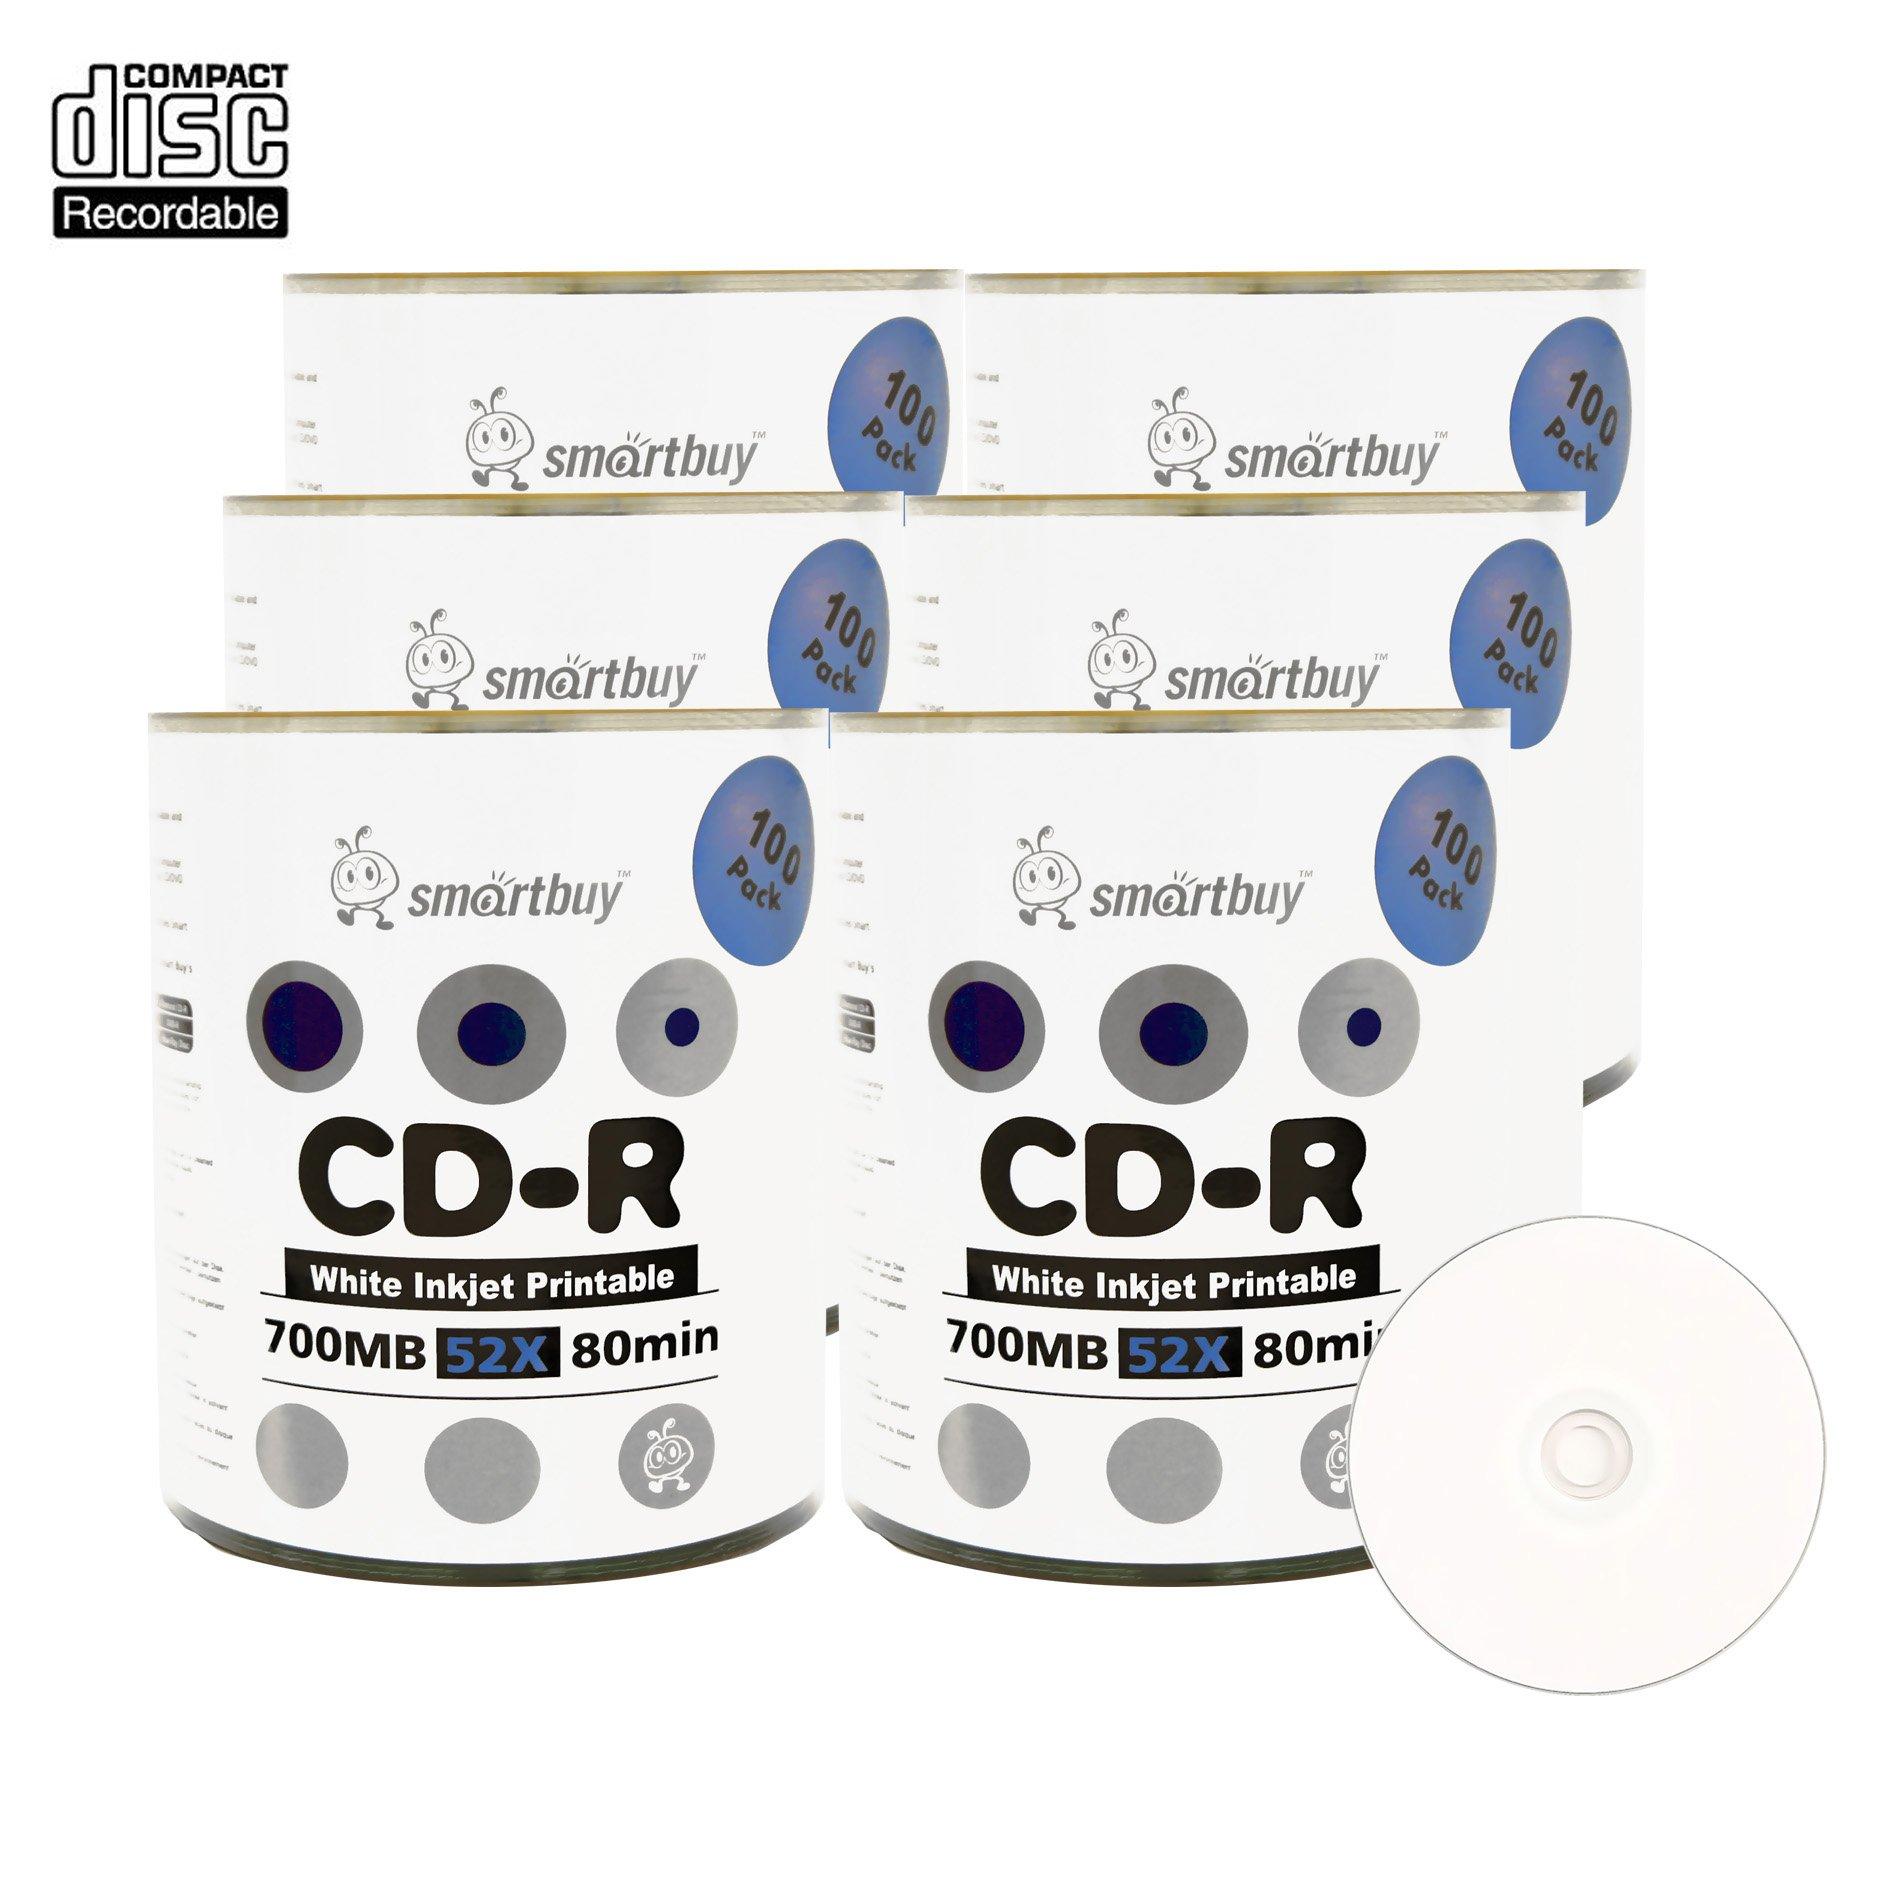 Smartbuy 700mb/80min 52x CD-R White Inkjet Hub Printable Blank Recordable Media Disc (600-Disc)